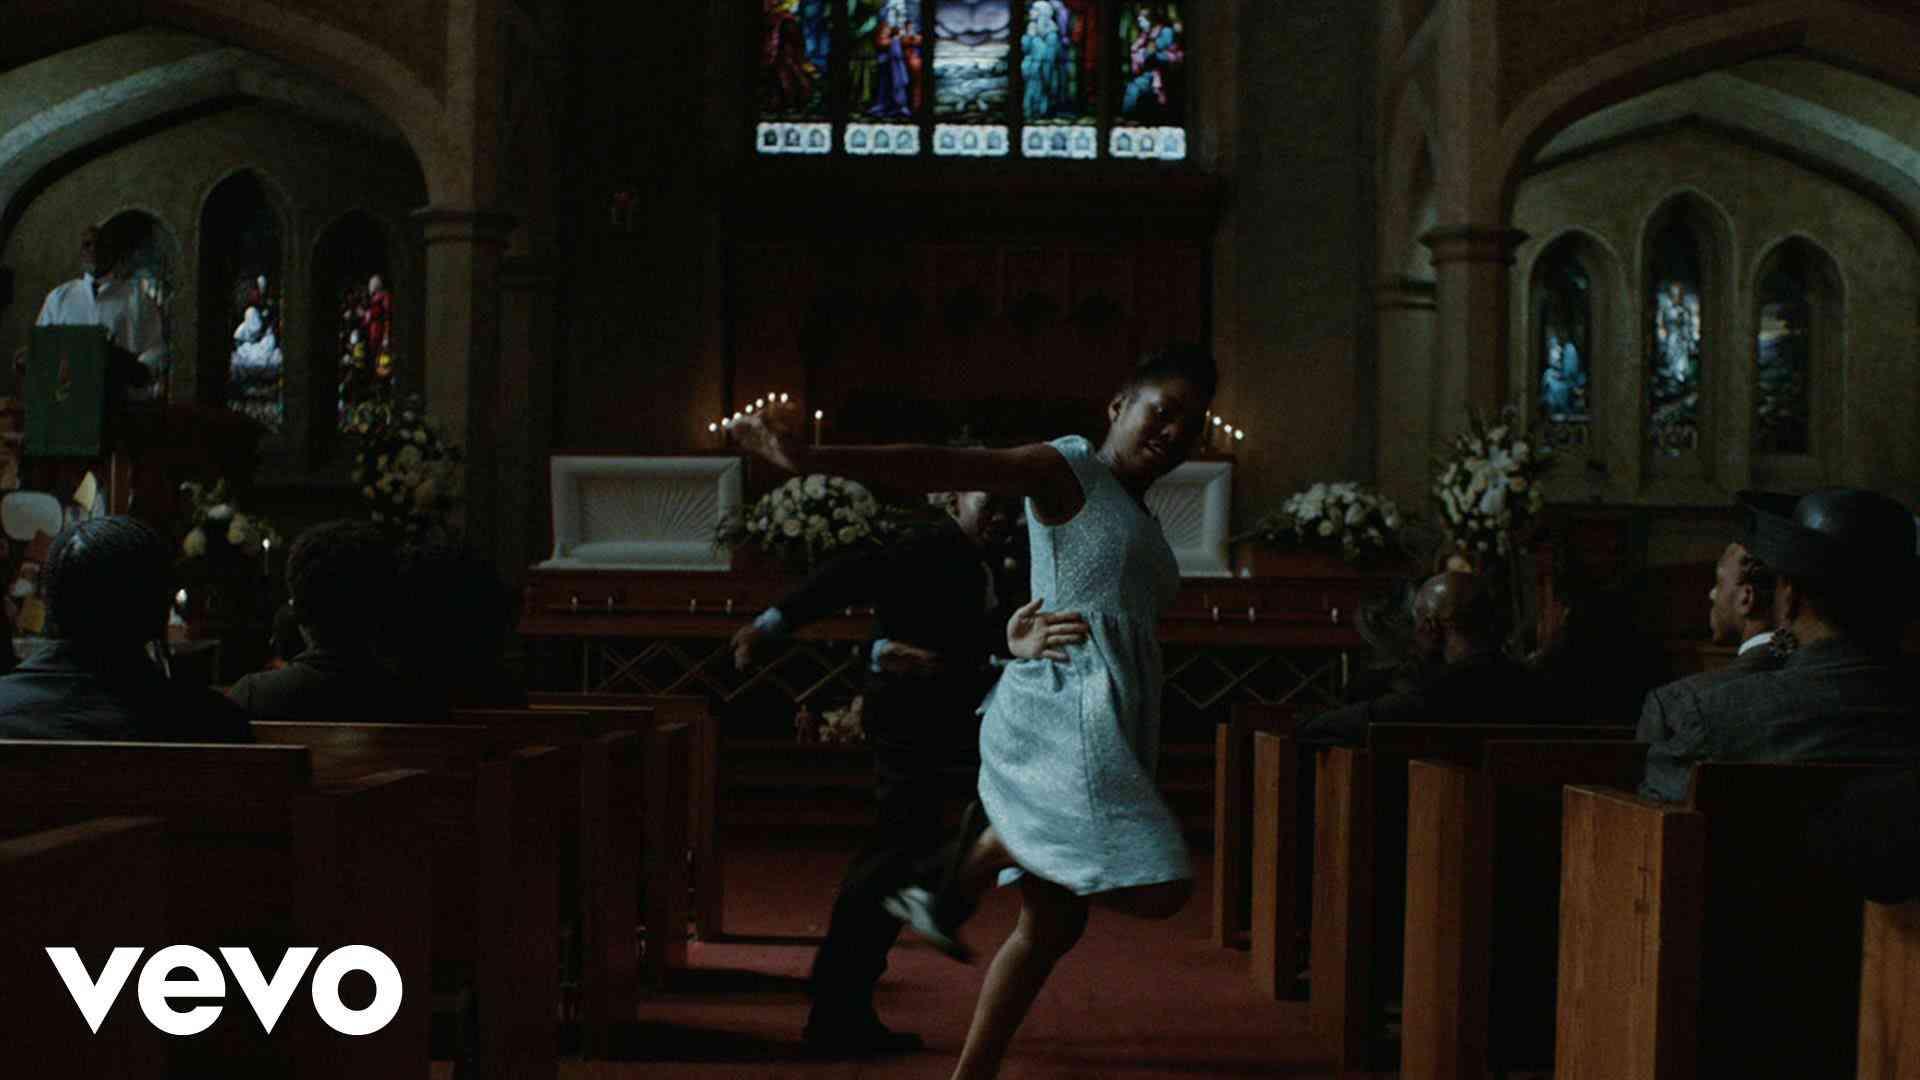 Flying Lotus - Never Catch Me ft. Kendrick Lamar - YouTube